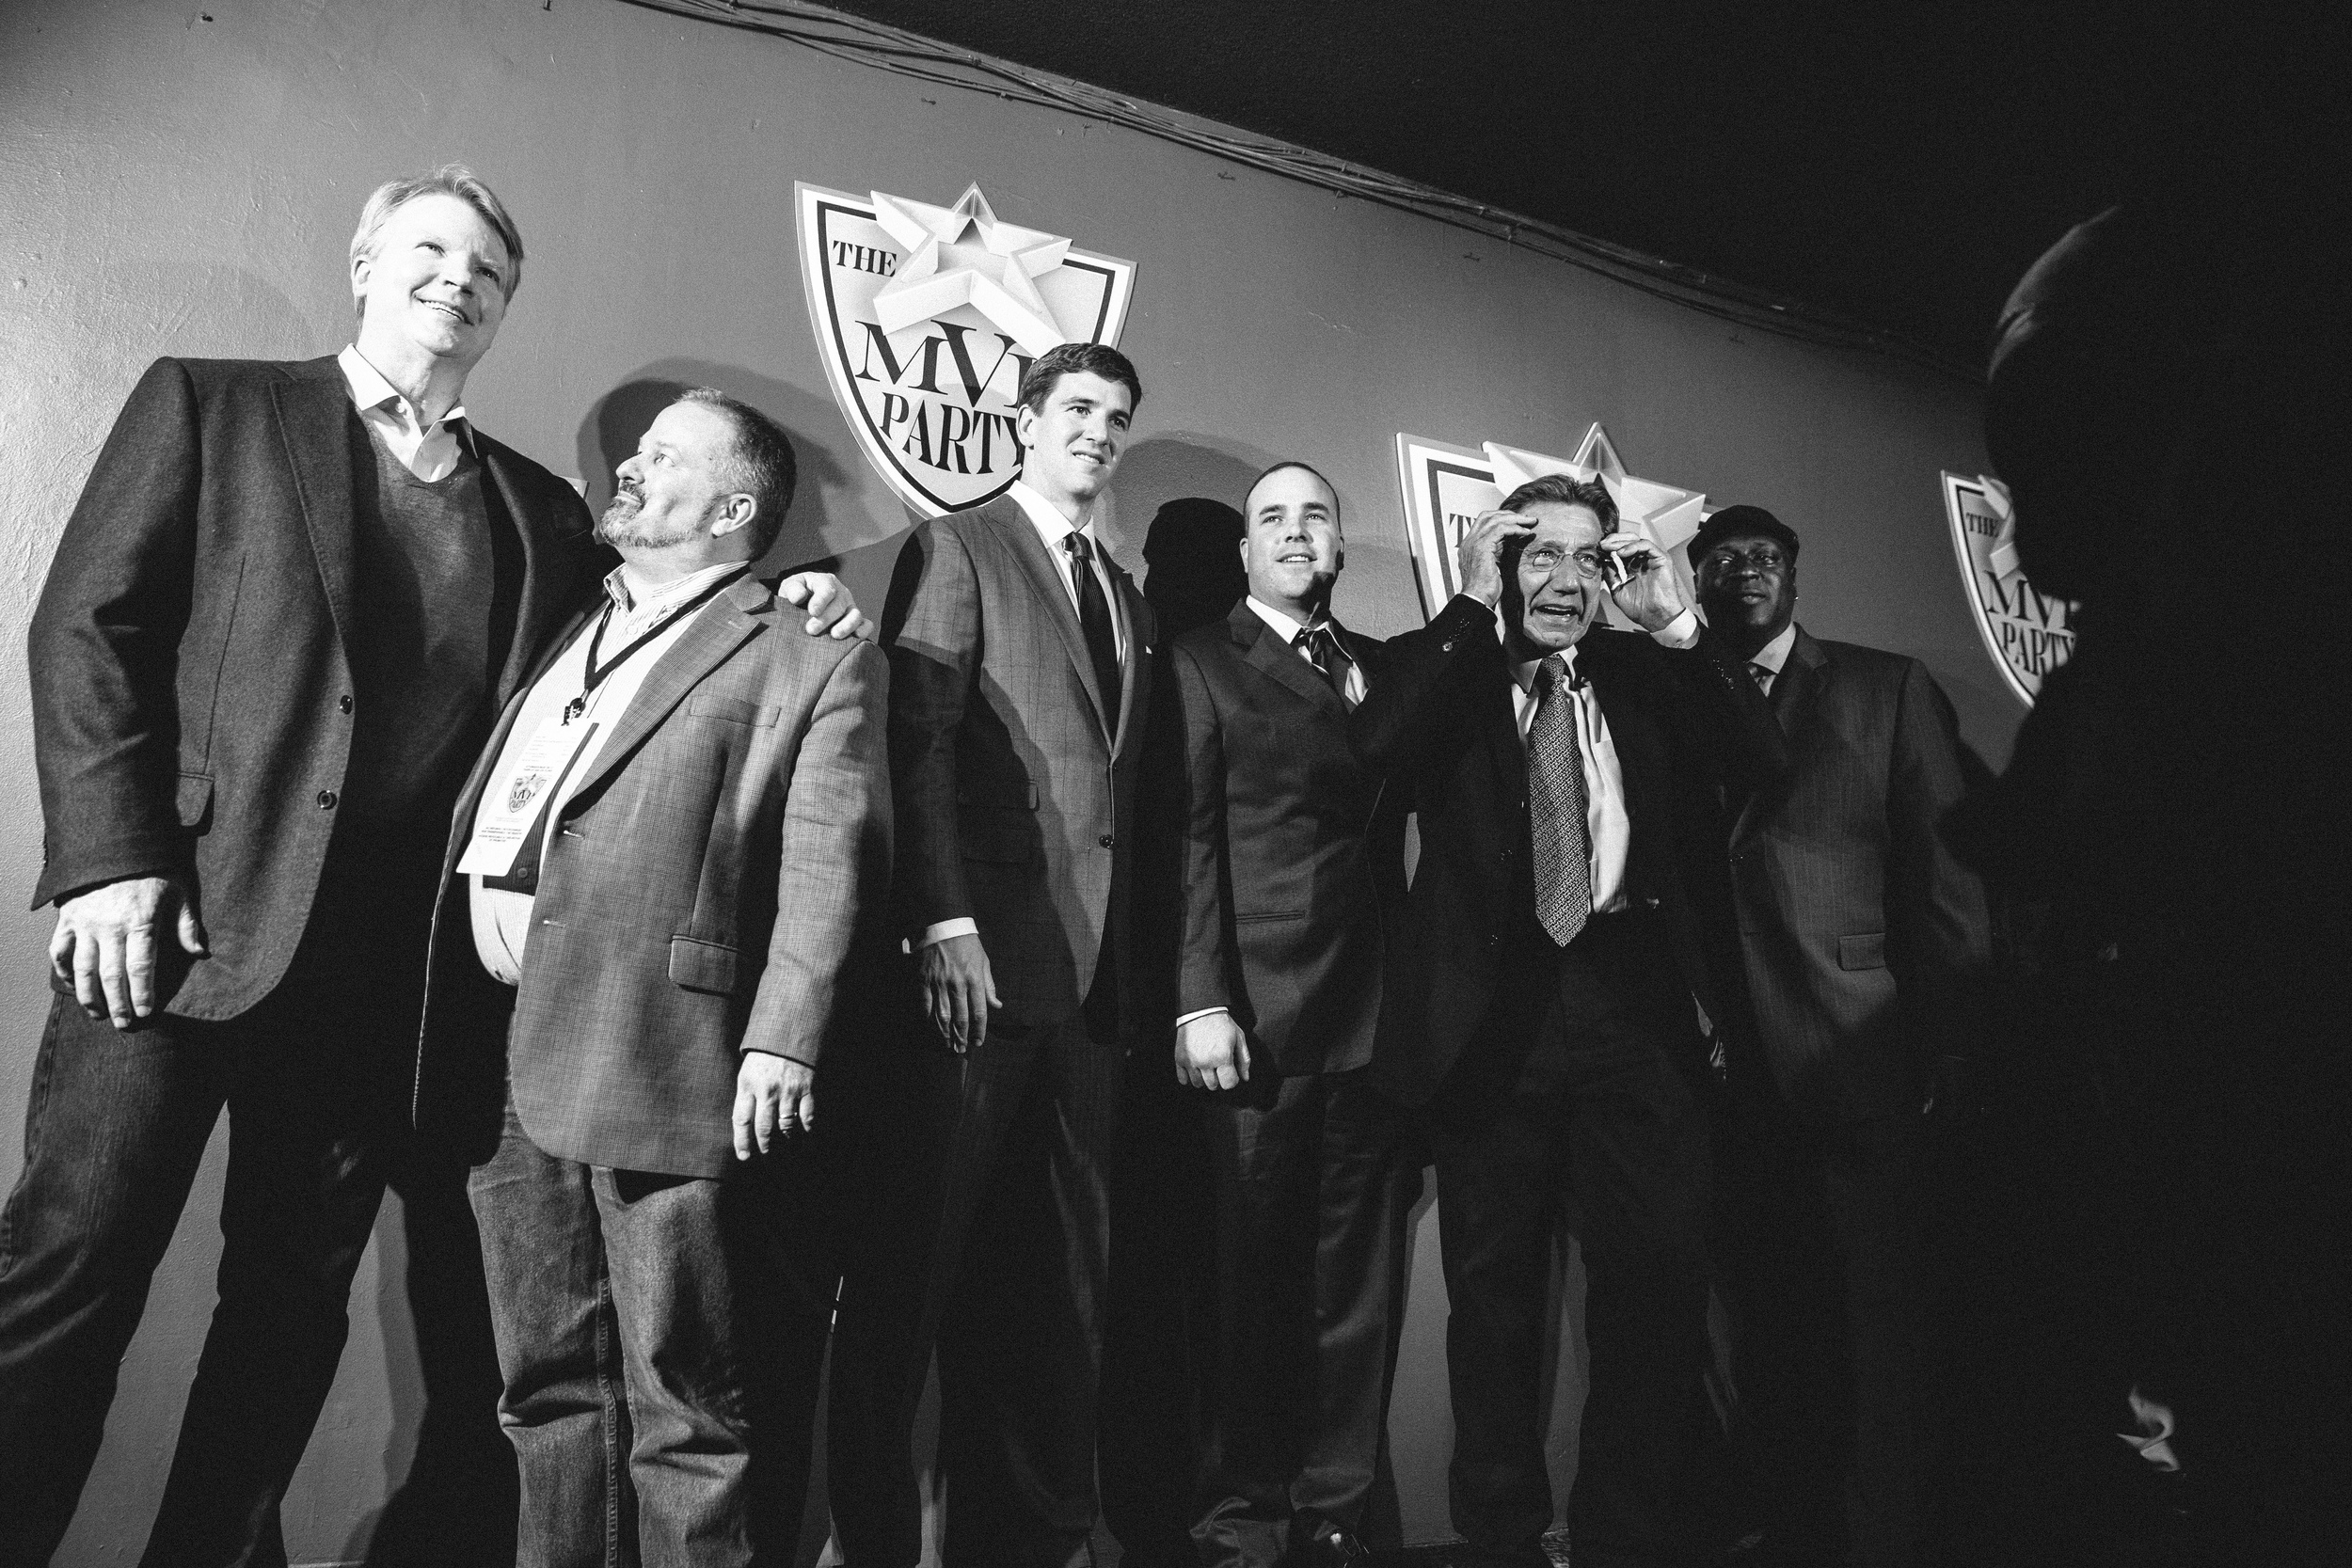 Phil Sims, Eli Manning, and Joe Namath, Roseland Ballroom